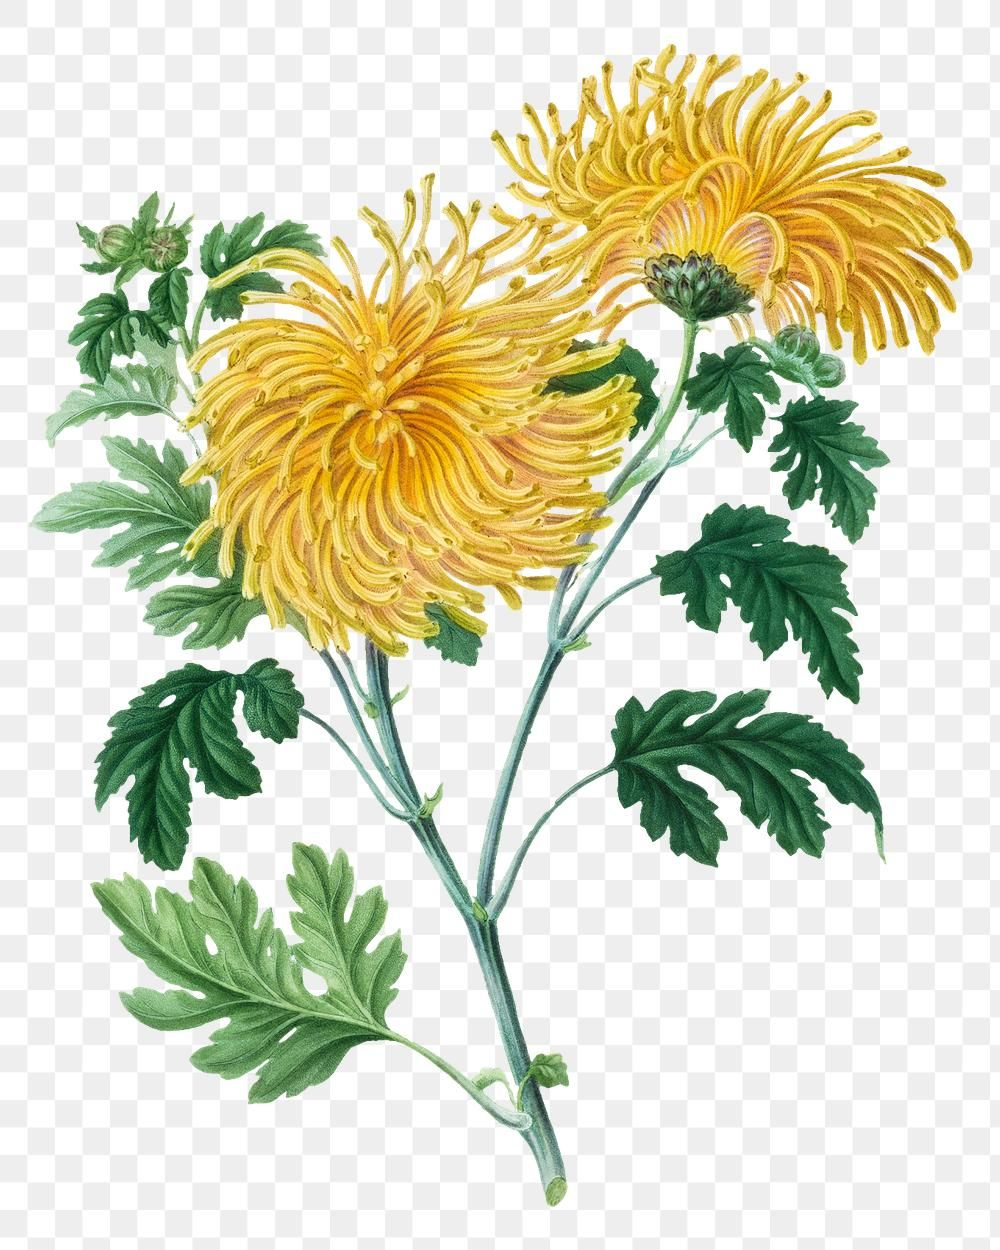 Hand Drawn Blooming Yellow Chrysanthemum Design Element Free Image By Rawpixel Com Aom Woralu In 2020 Yellow Chrysanthemum How To Draw Hands Botanical Illustration